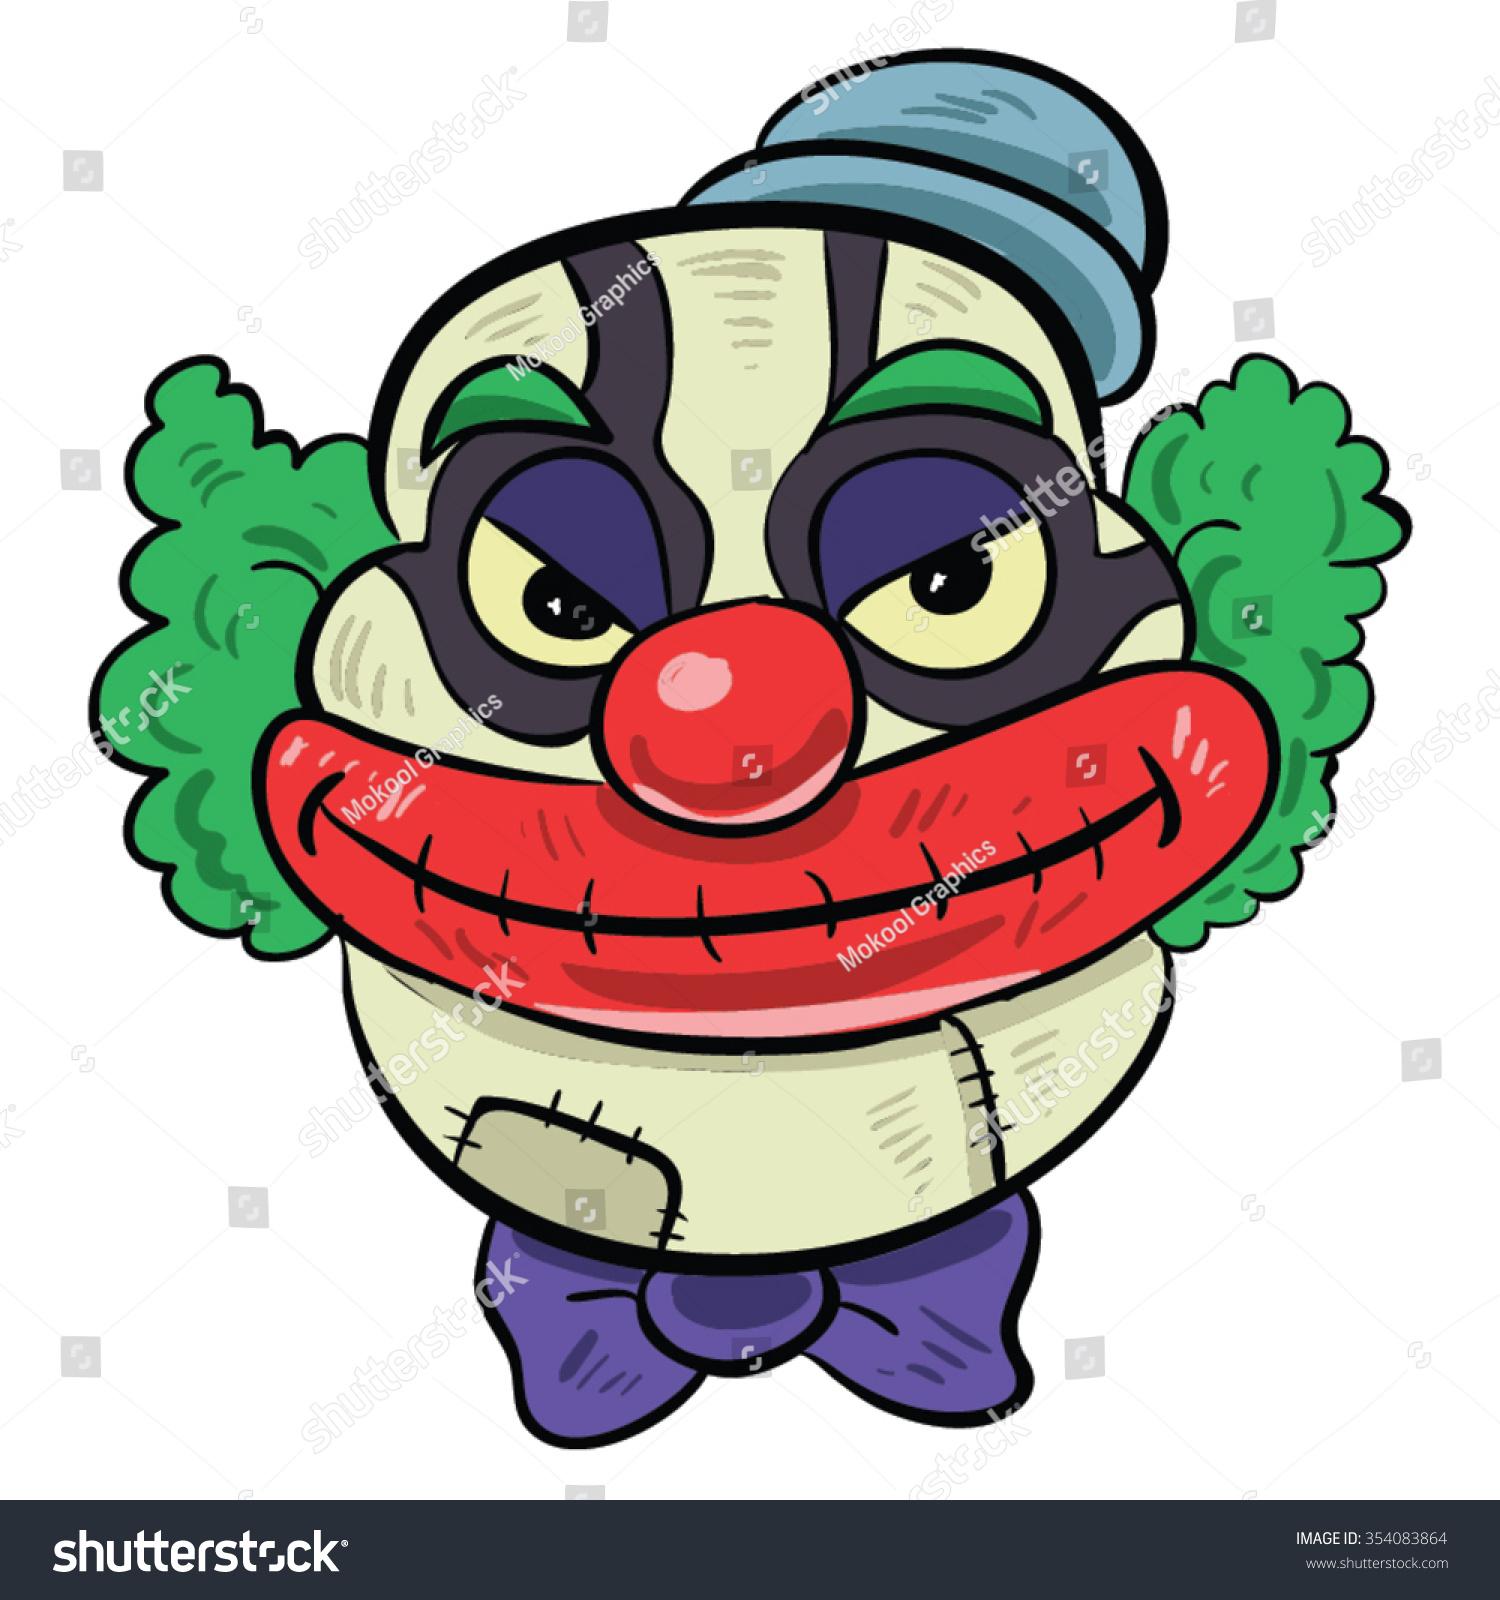 how to create an evil twin clown